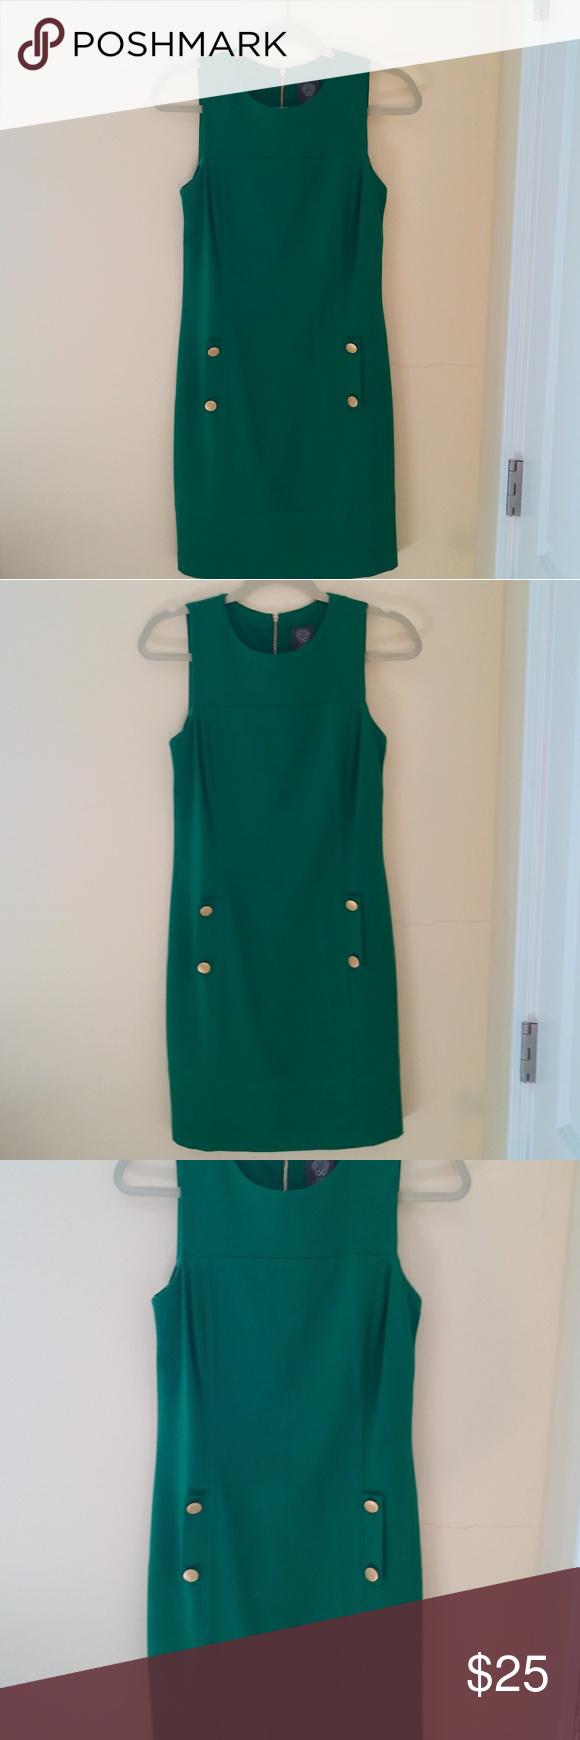 Vince Camuto Dress Beautiful Condition Vibrant Green Dress Size 2 15 Armpit Across 35 From Shoulder To Hem Vinc Vince Camuto Dress Clothes Design Fashion [ 1740 x 580 Pixel ]